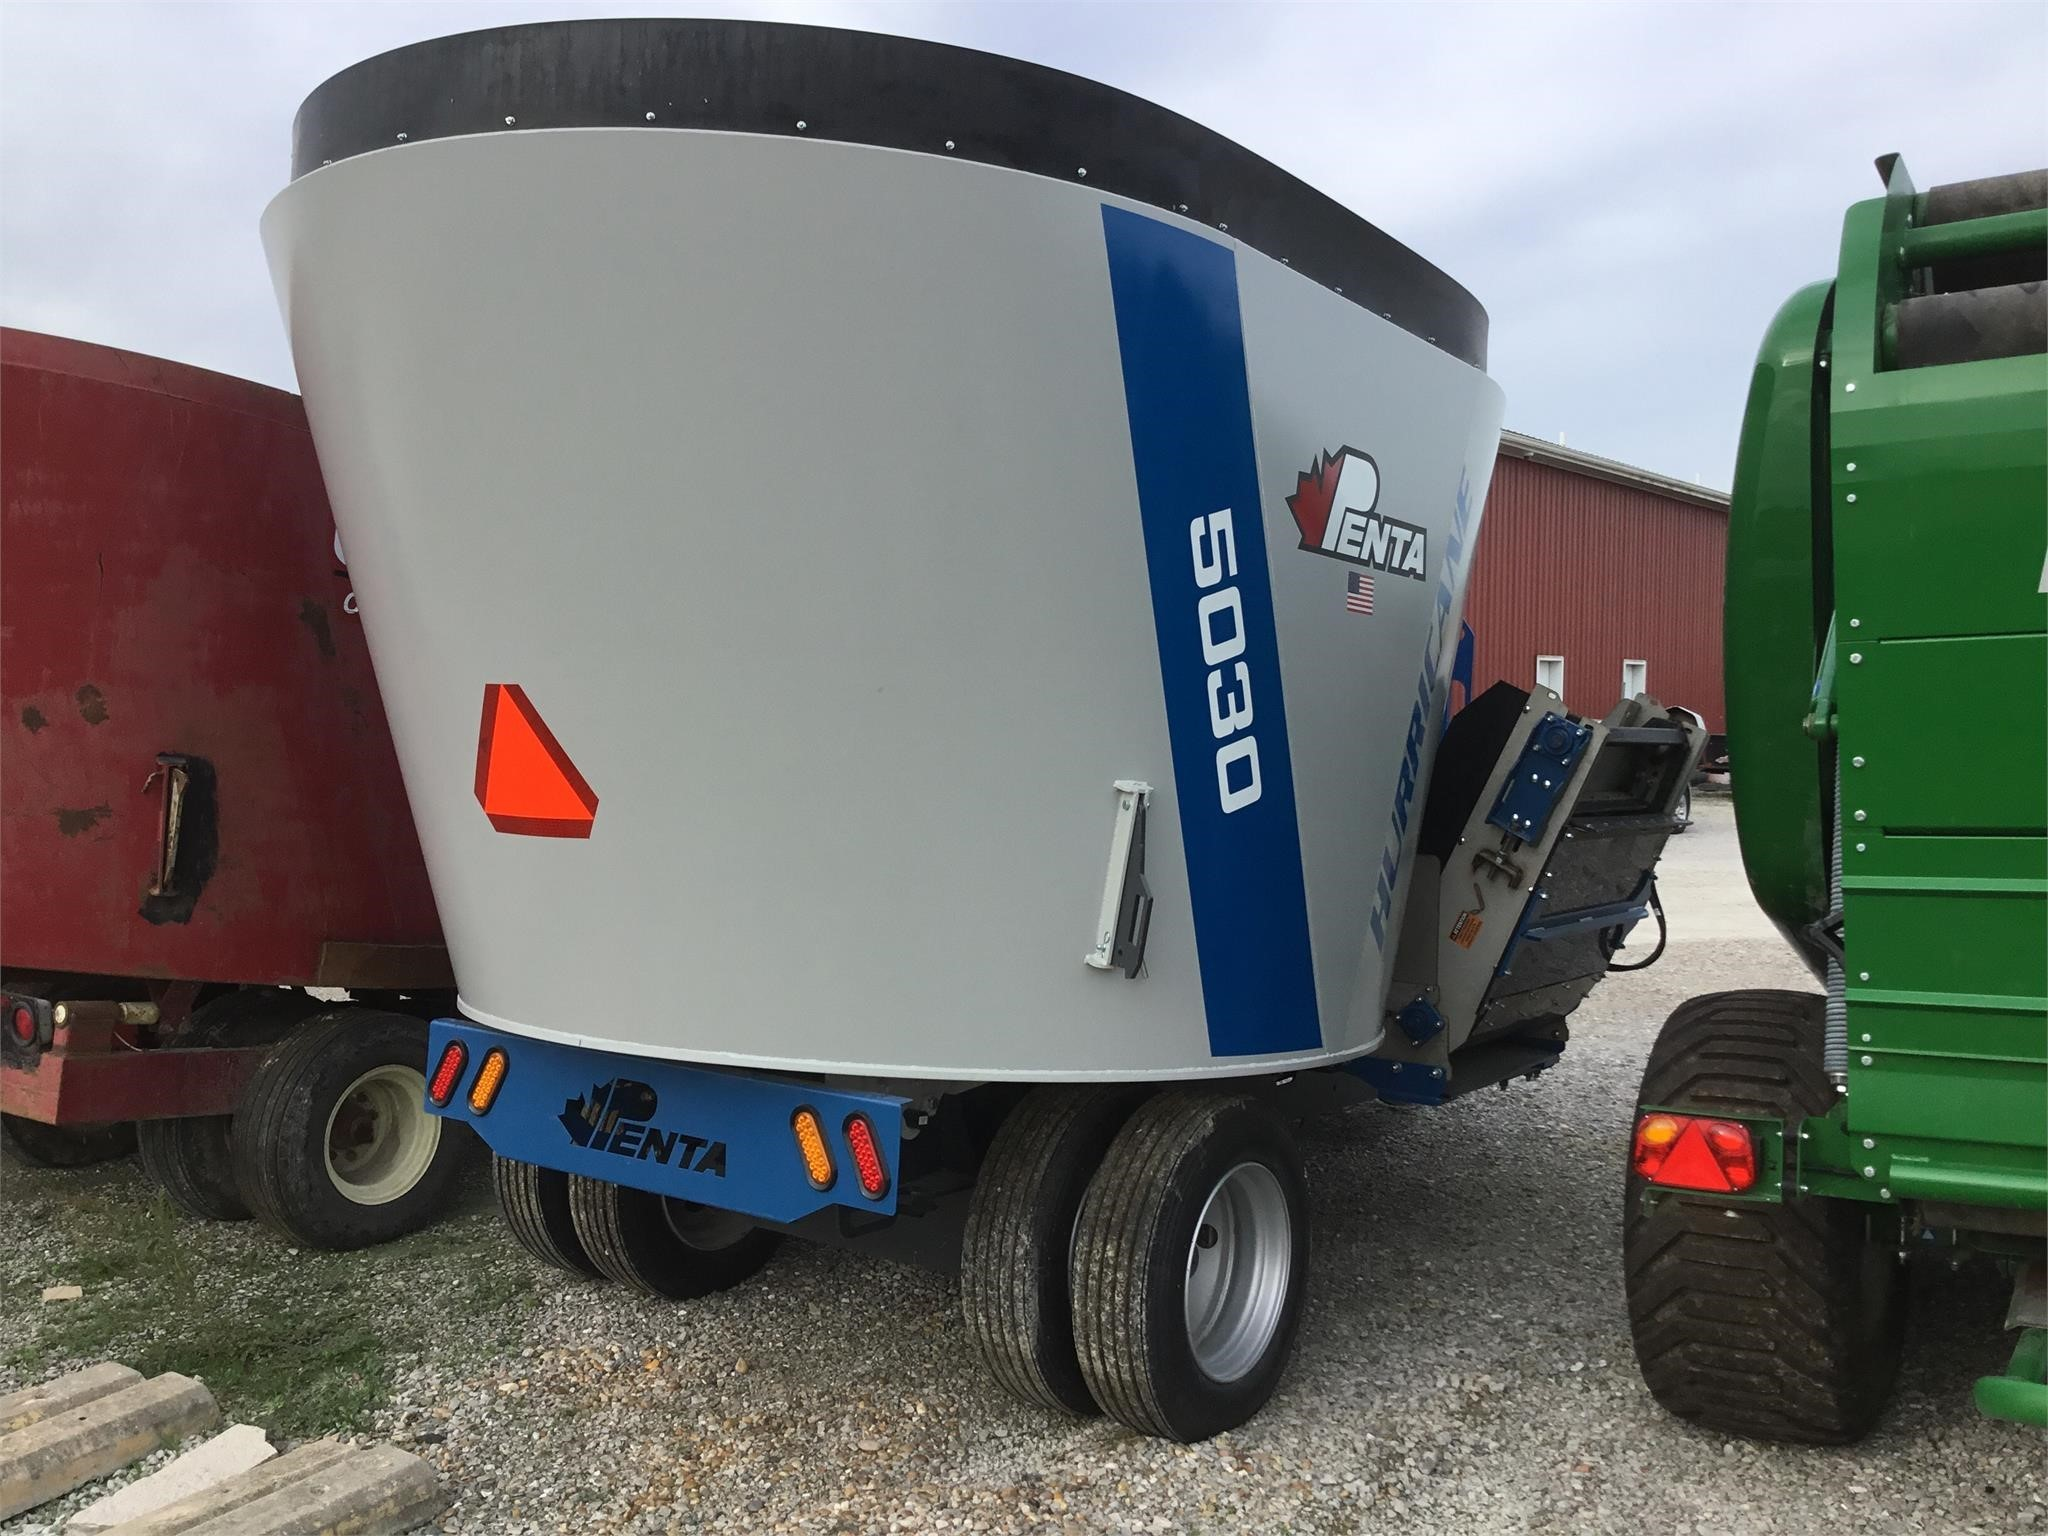 2020 Penta 5030 Grinders and Mixer